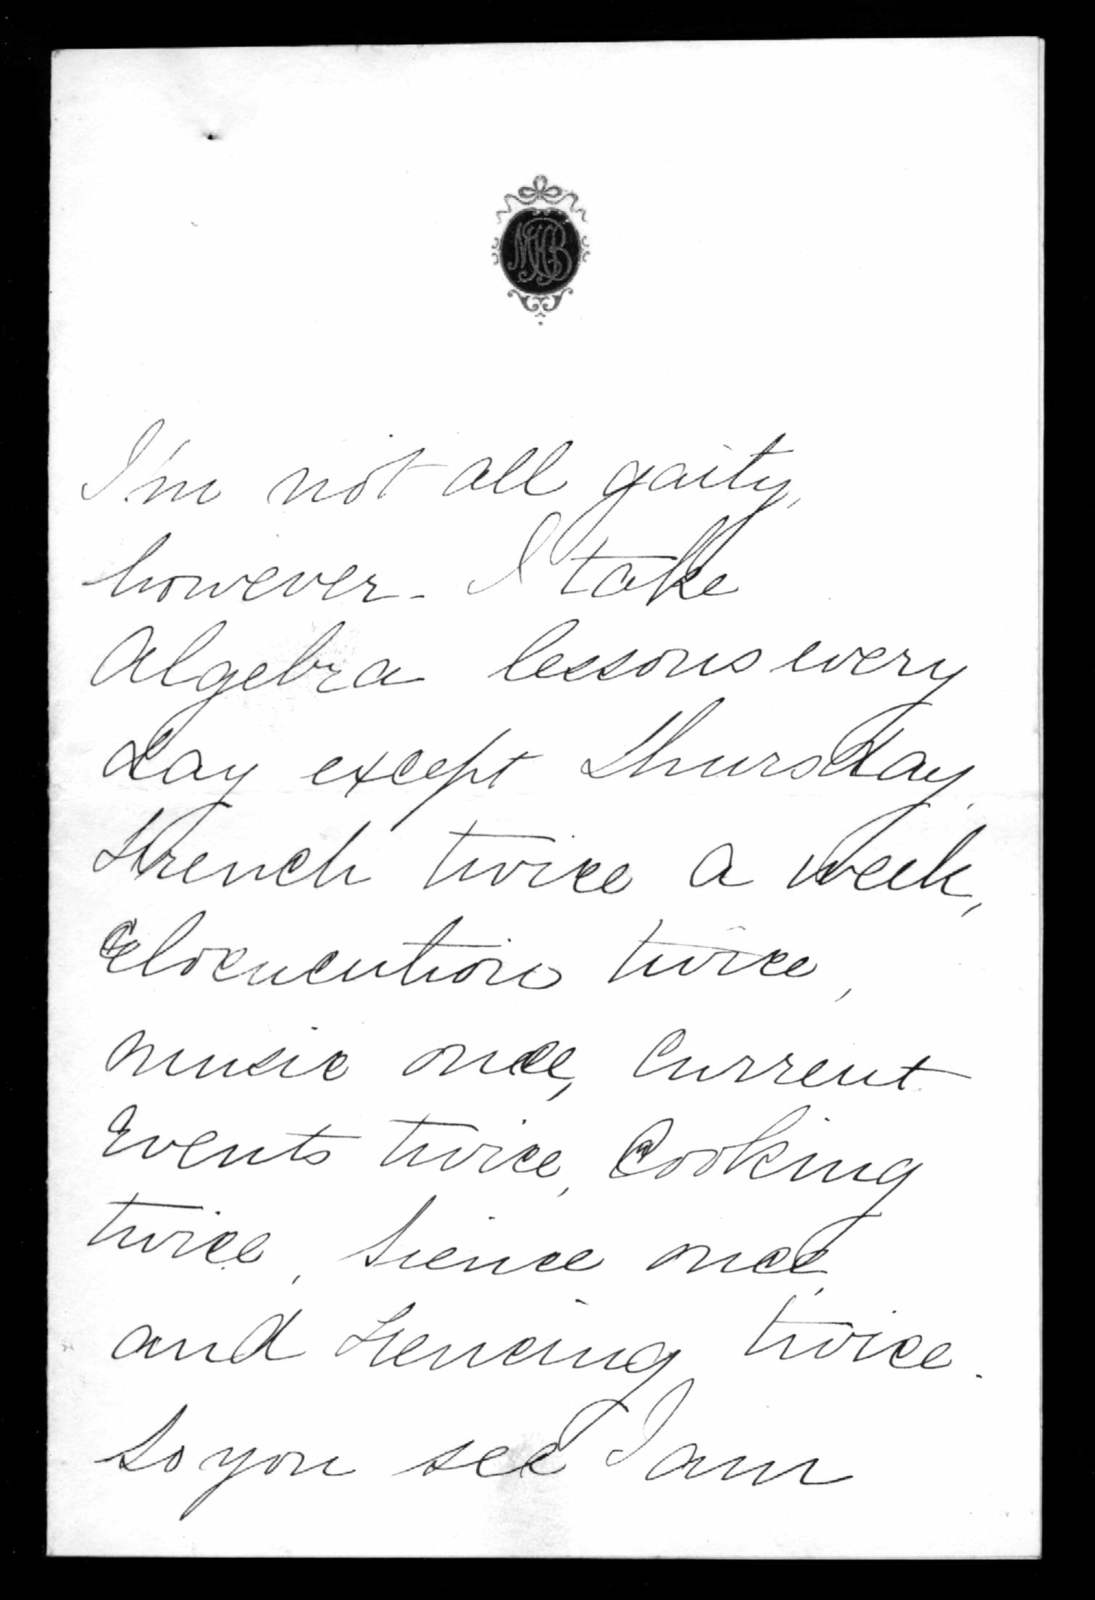 Letter from Marian Bell Fairchild to Alexander Graham Bell, undated